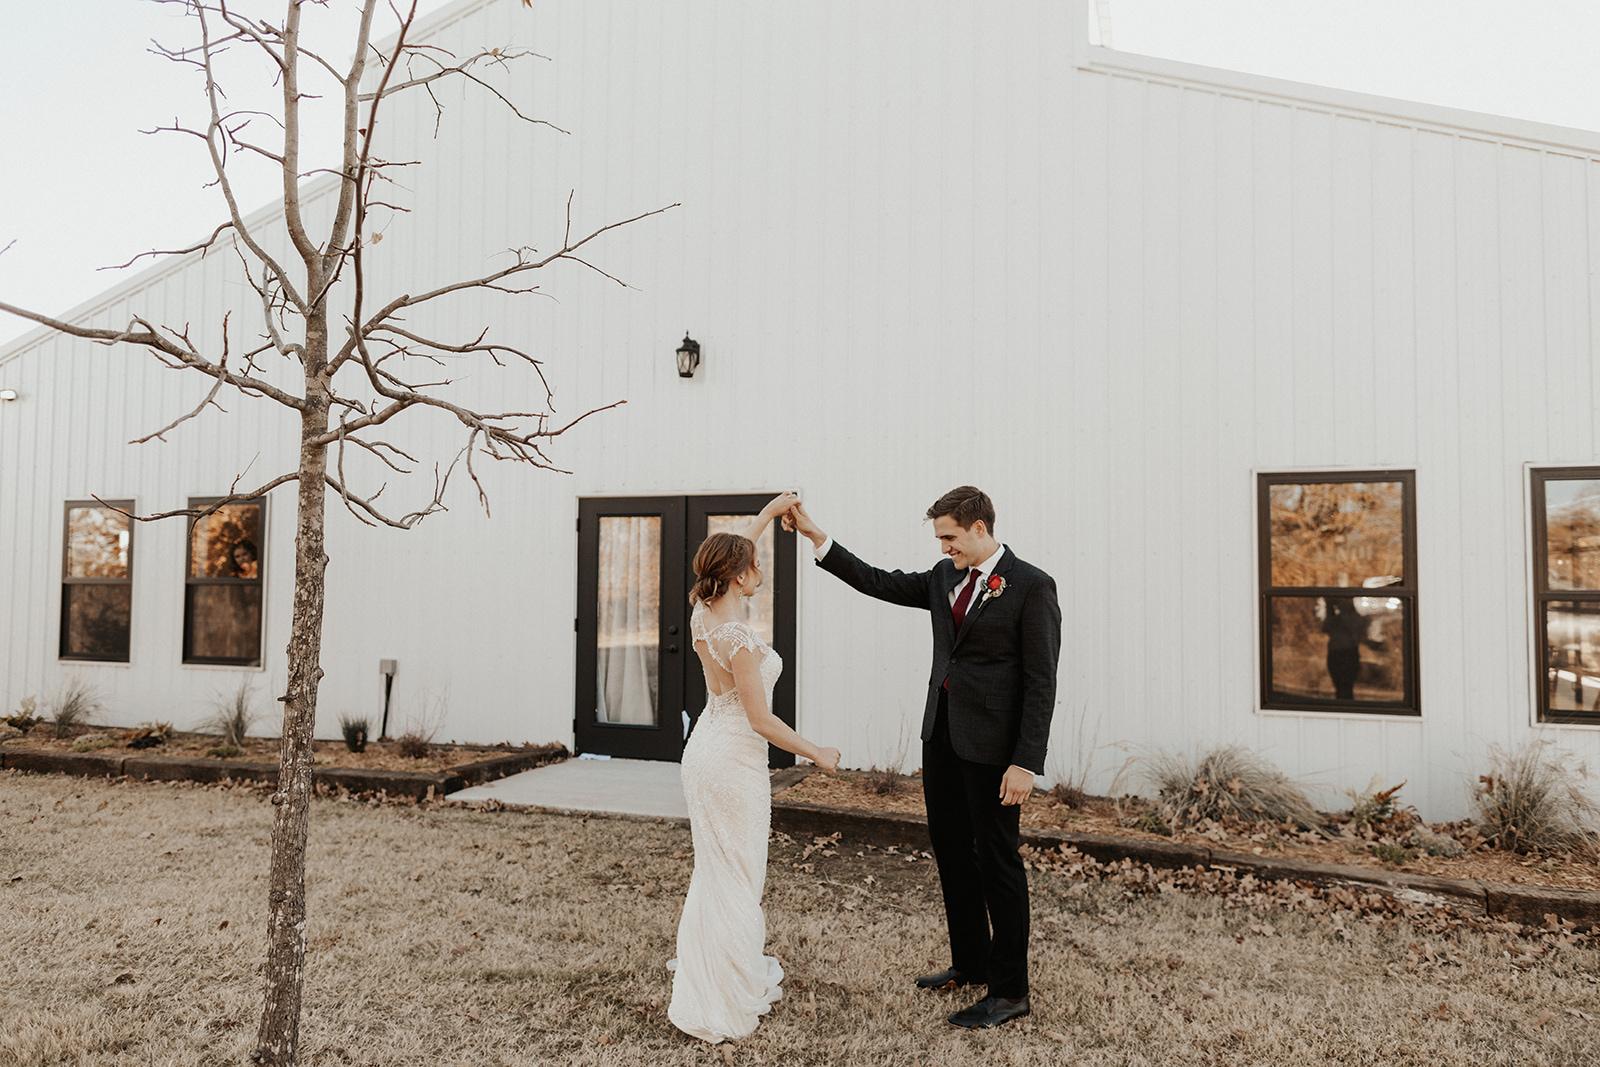 Best Wedding Venue in Tulsa Bixby Dream Point Ranch 16.jpg